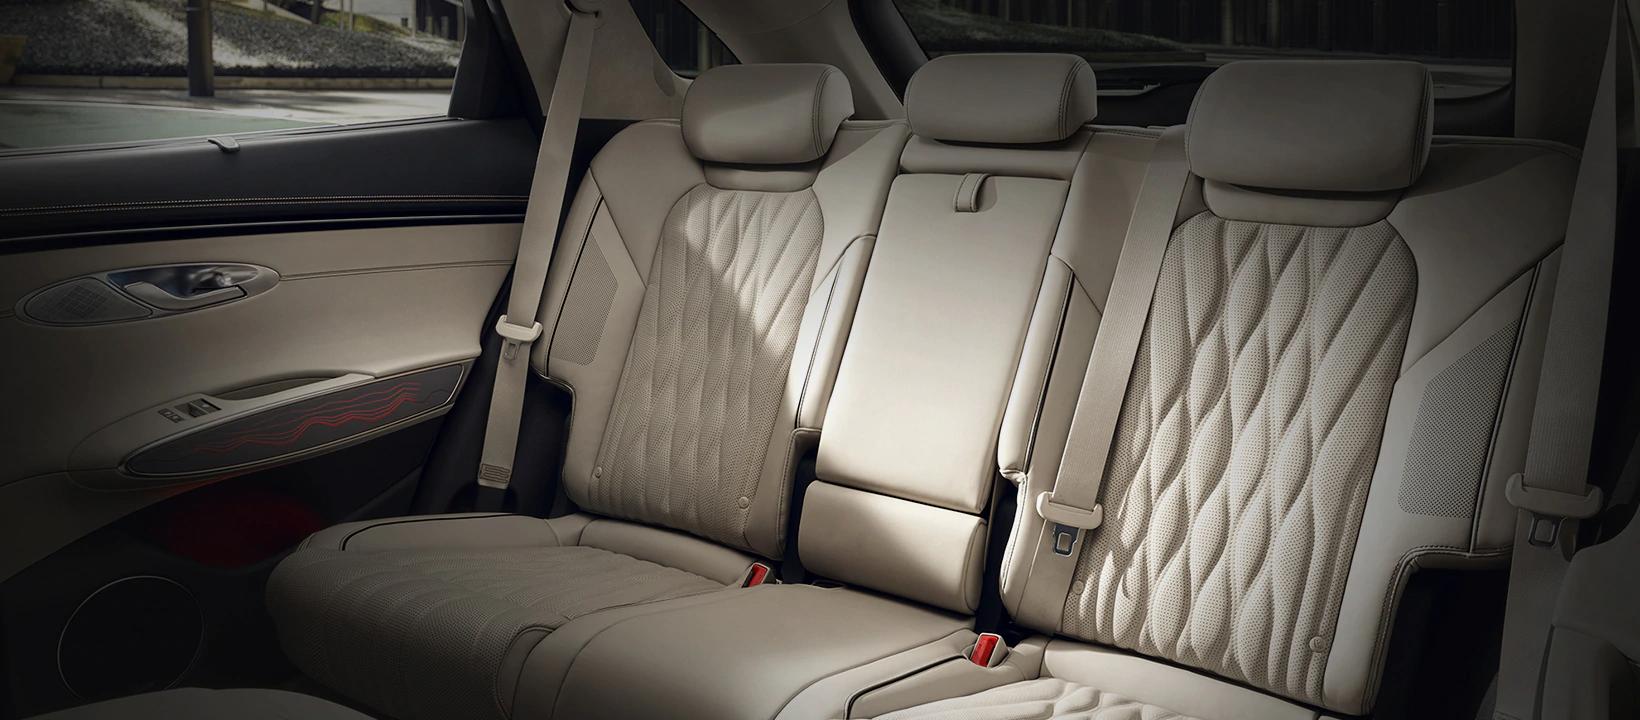 genesis-kr-technology-gv70-rear-seat-desktop-1640x720-ko.png